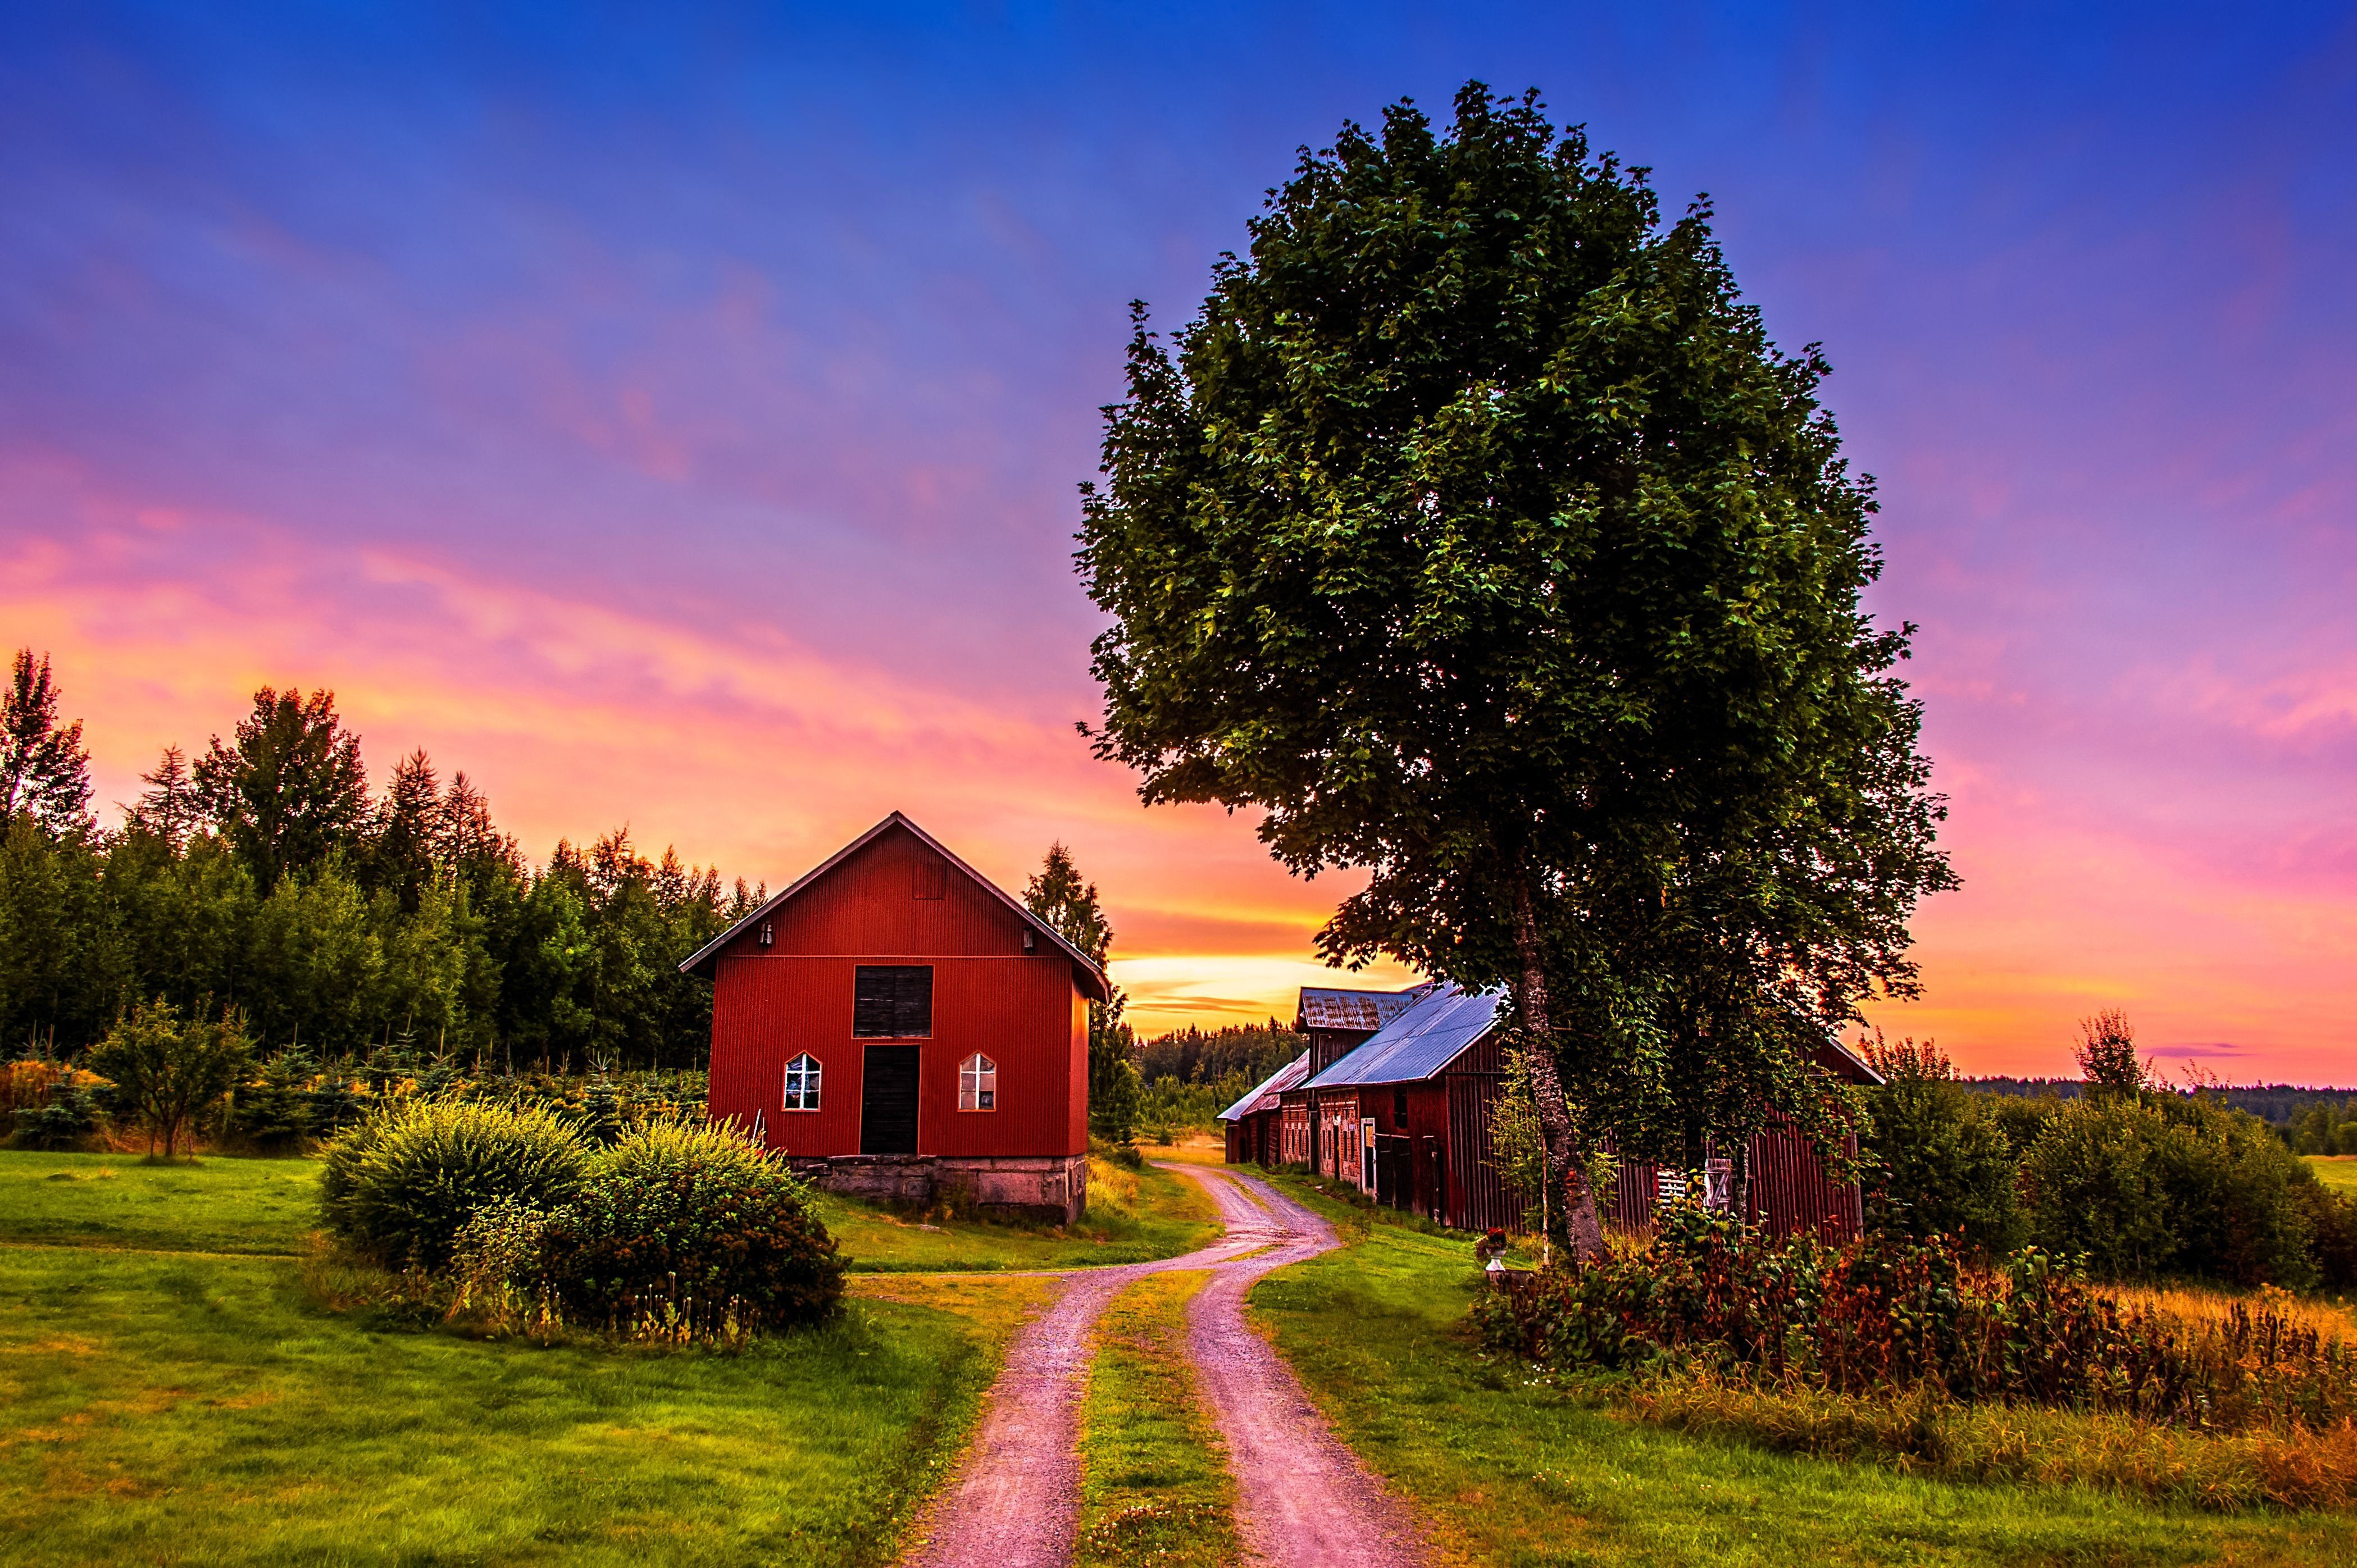 sunset trees road home landscape rustic farm house 4196x2792